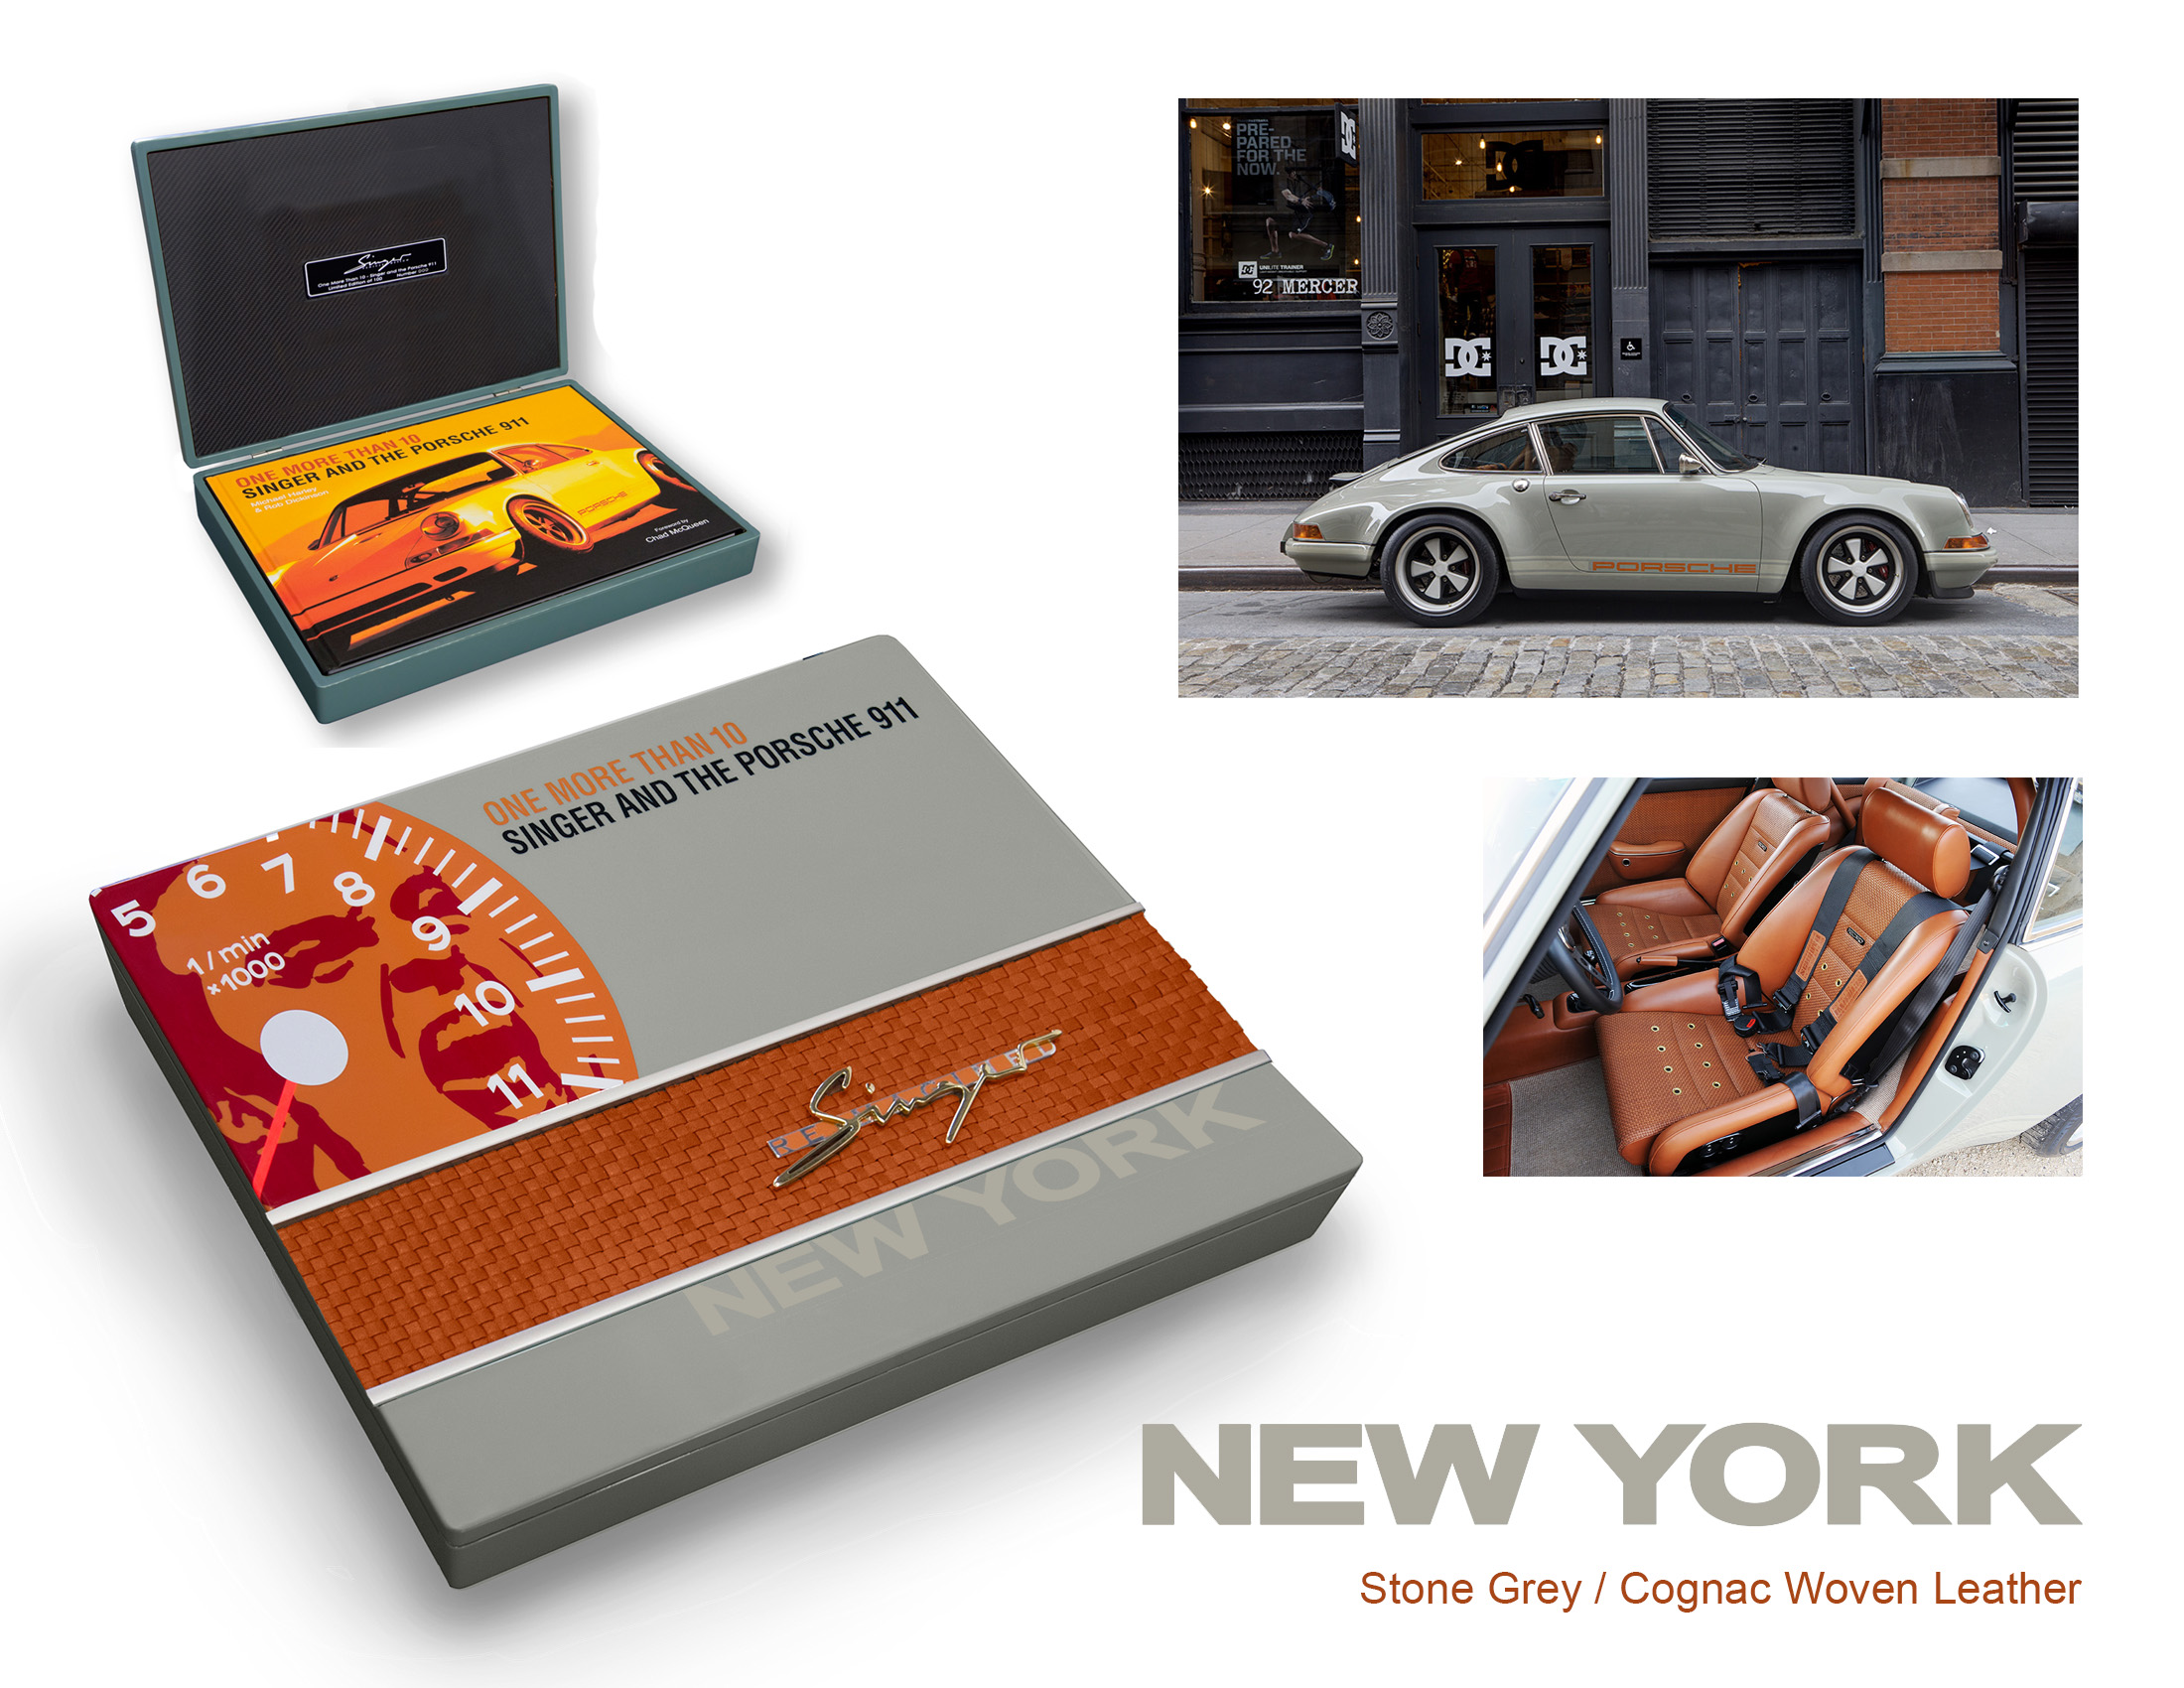 new york layout.jpg